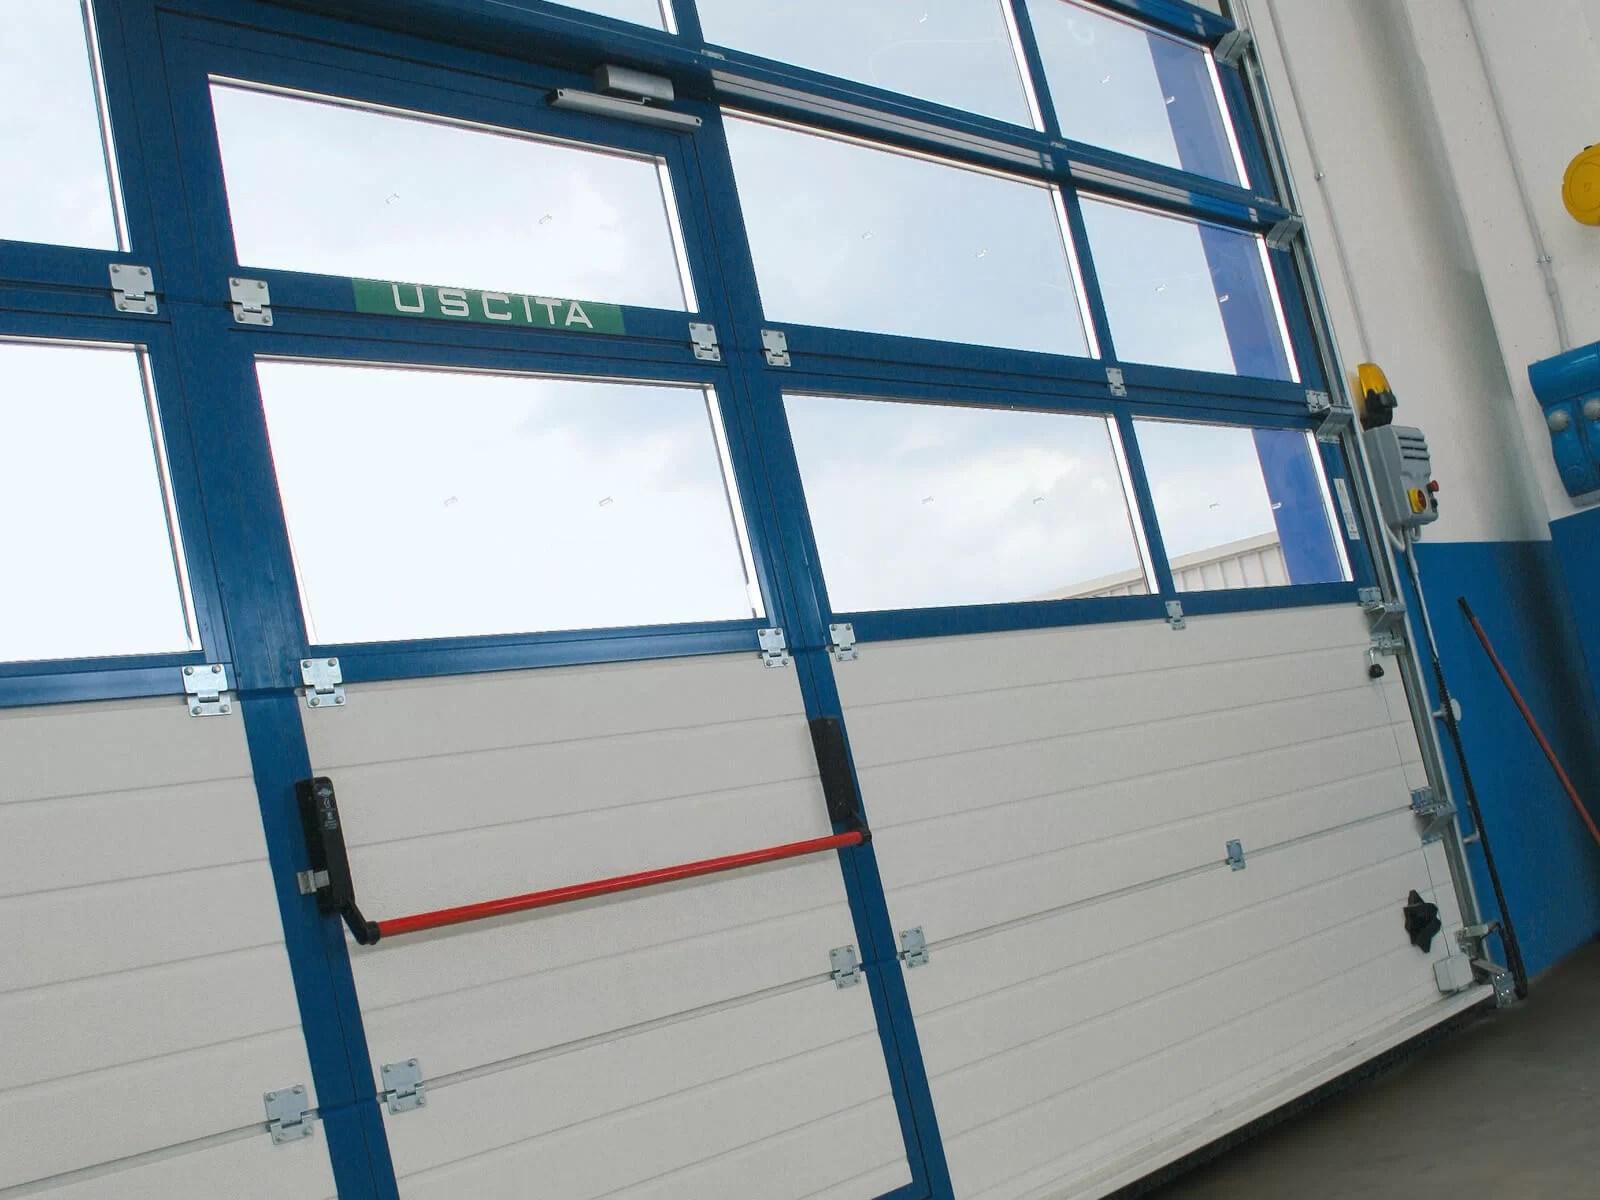 Portone sezionale industriale SECURA - Stucco blu RAL 5010 Visa porta pedonale vista interna